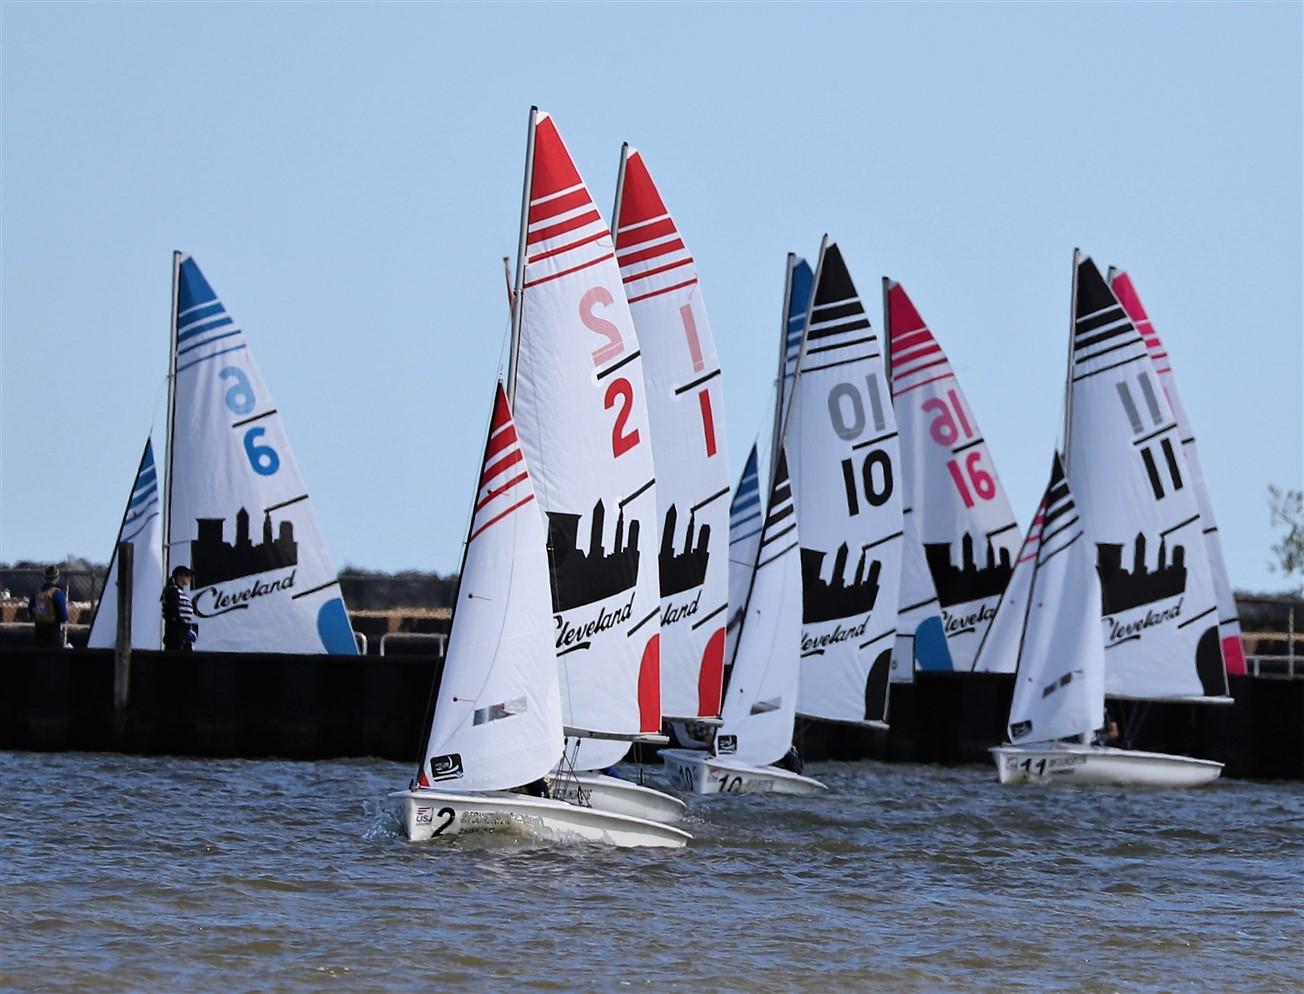 2018 09 29 66 Cleveland US Sailing Championships.jpg